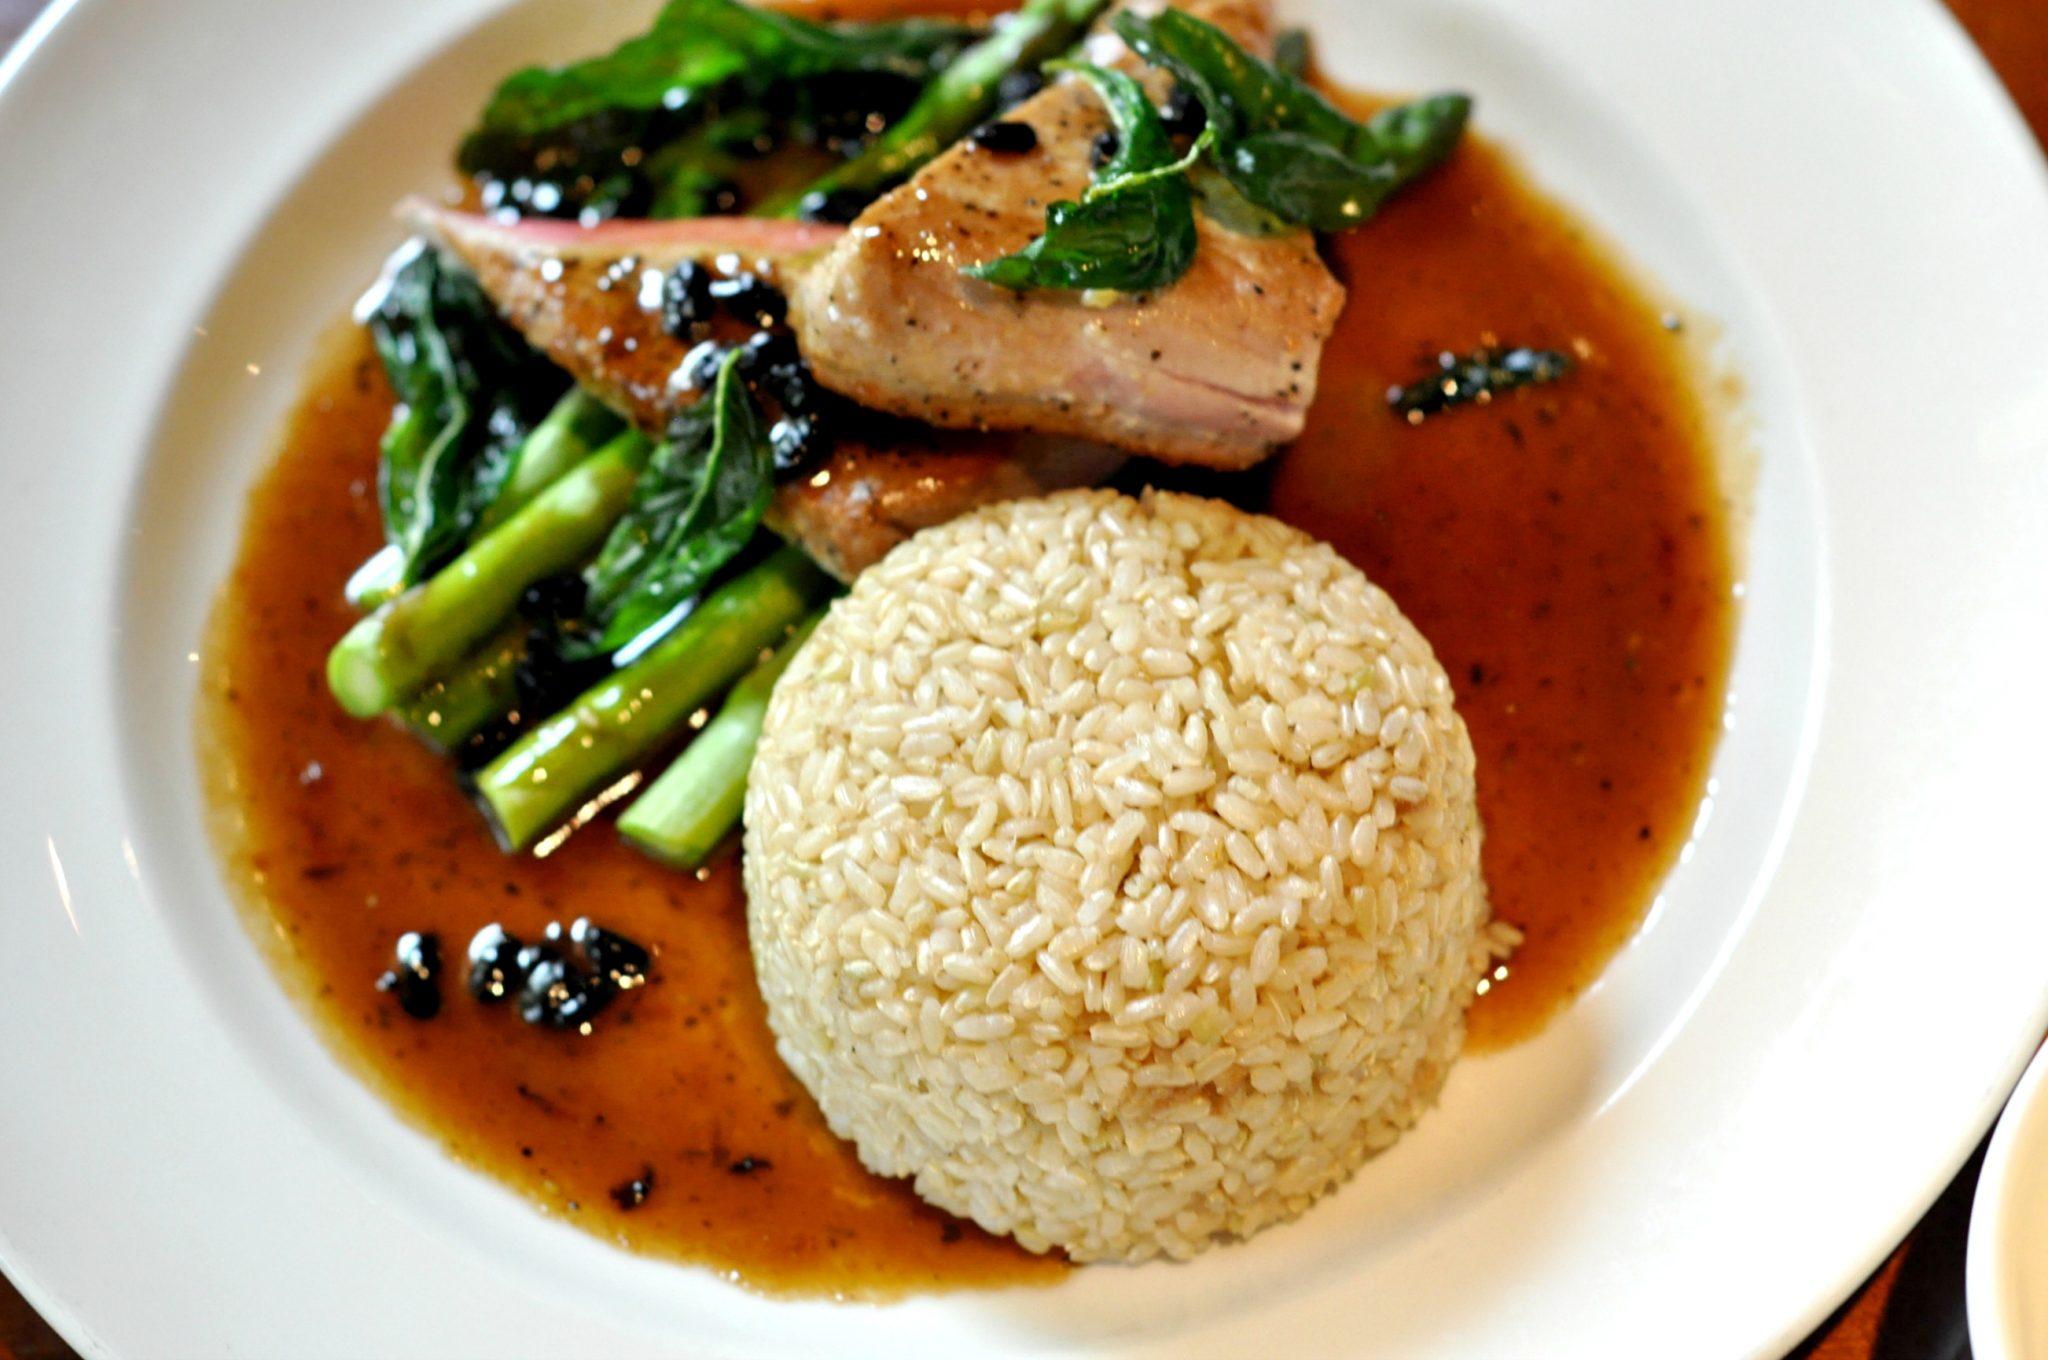 Yard House PAN SEARED AHI seared rare, asparagus, chinese black bean sauce, fried basil brown rice